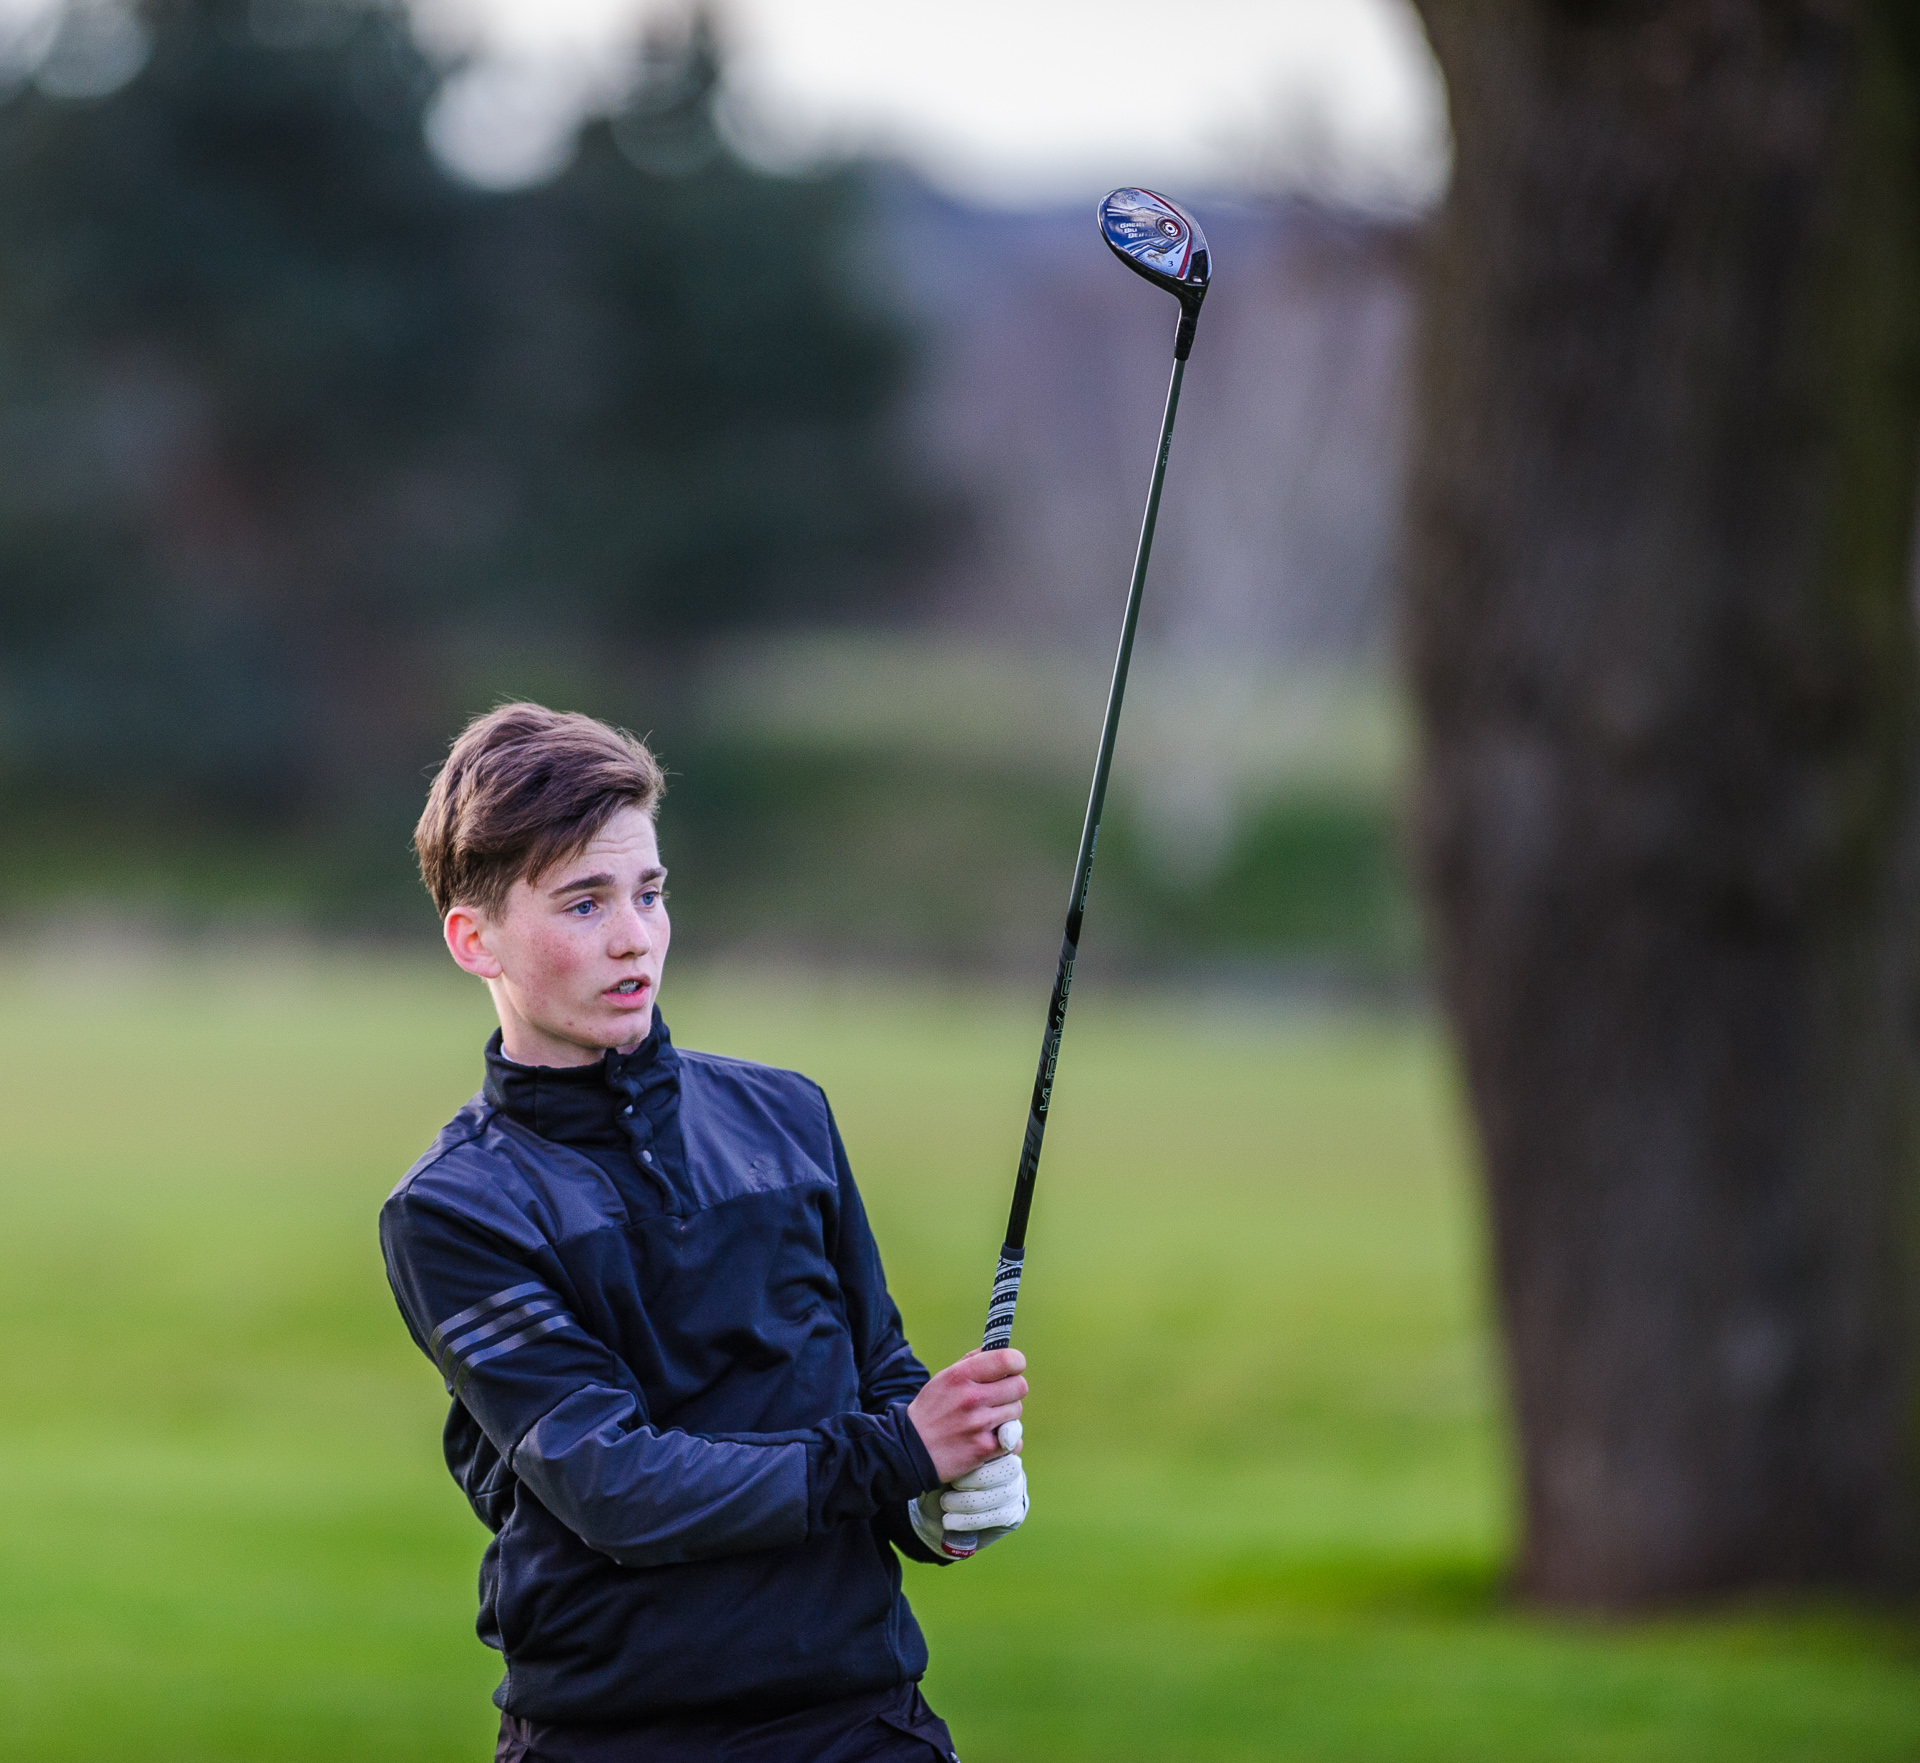 Kevindiss.com golf course photography Hawkstone Park golf course-1632.jpg